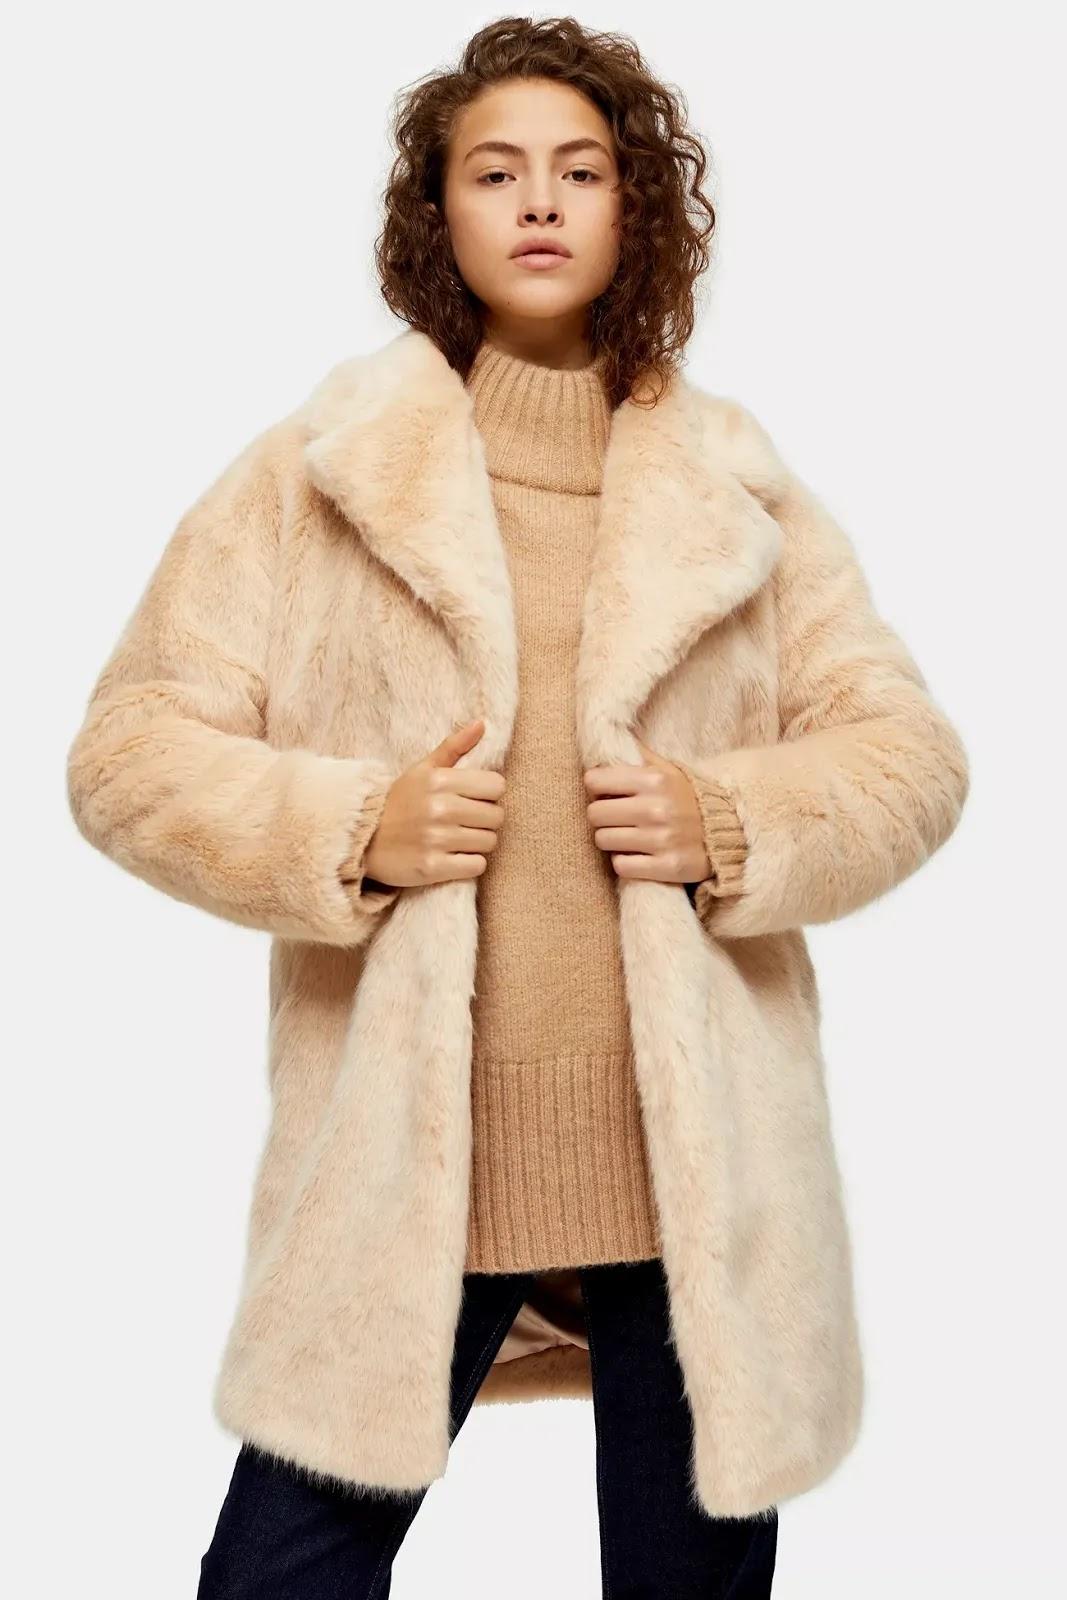 Luxe Nude Faux Fur Coat